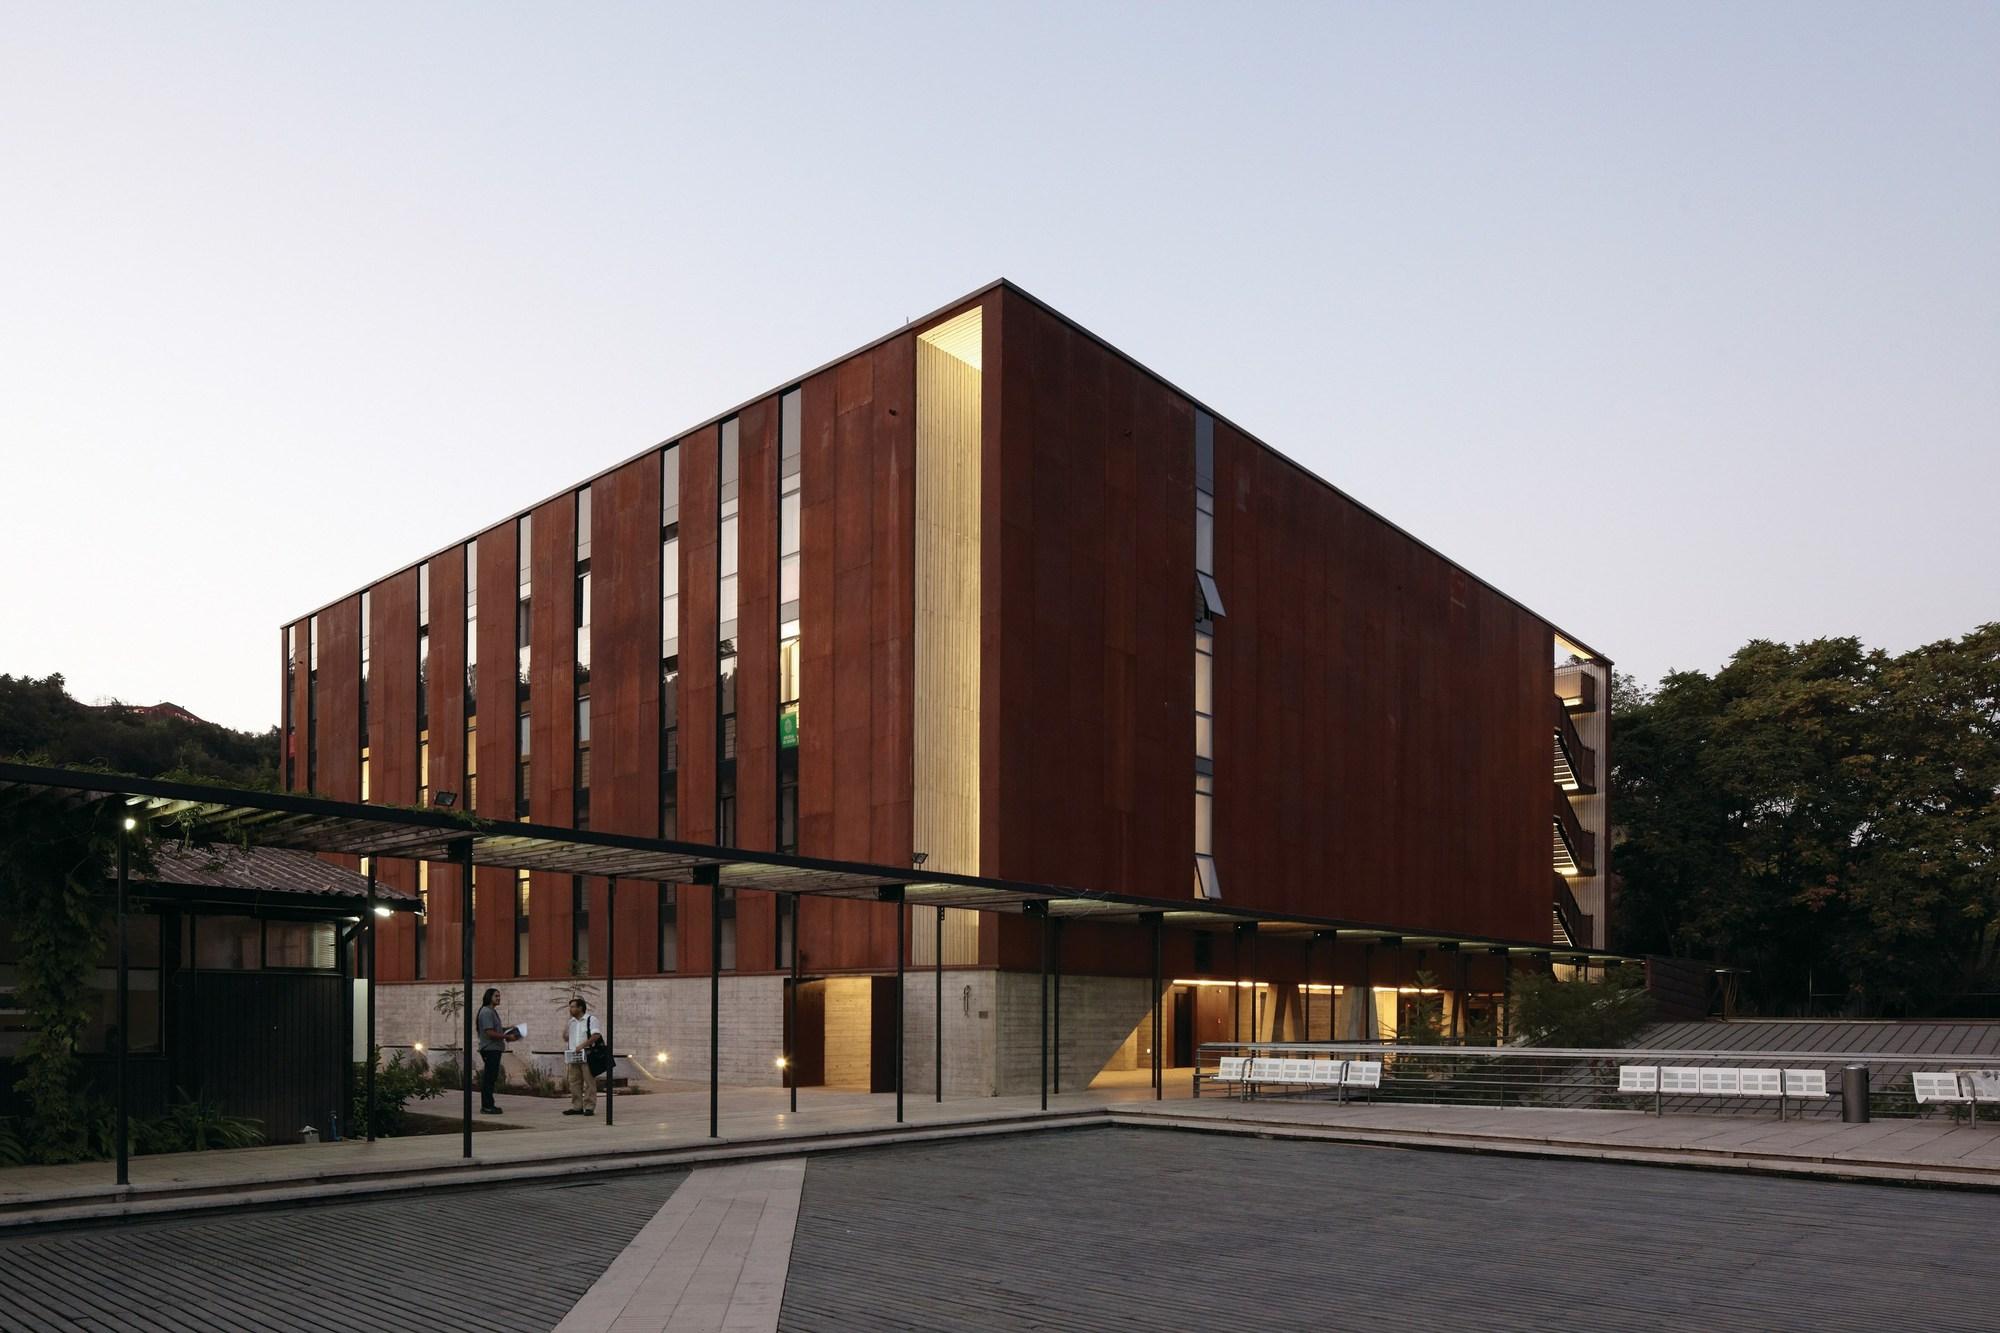 Escuela de dise o e instituto de estudios urbanos p for Mapa facultad de arquitectura